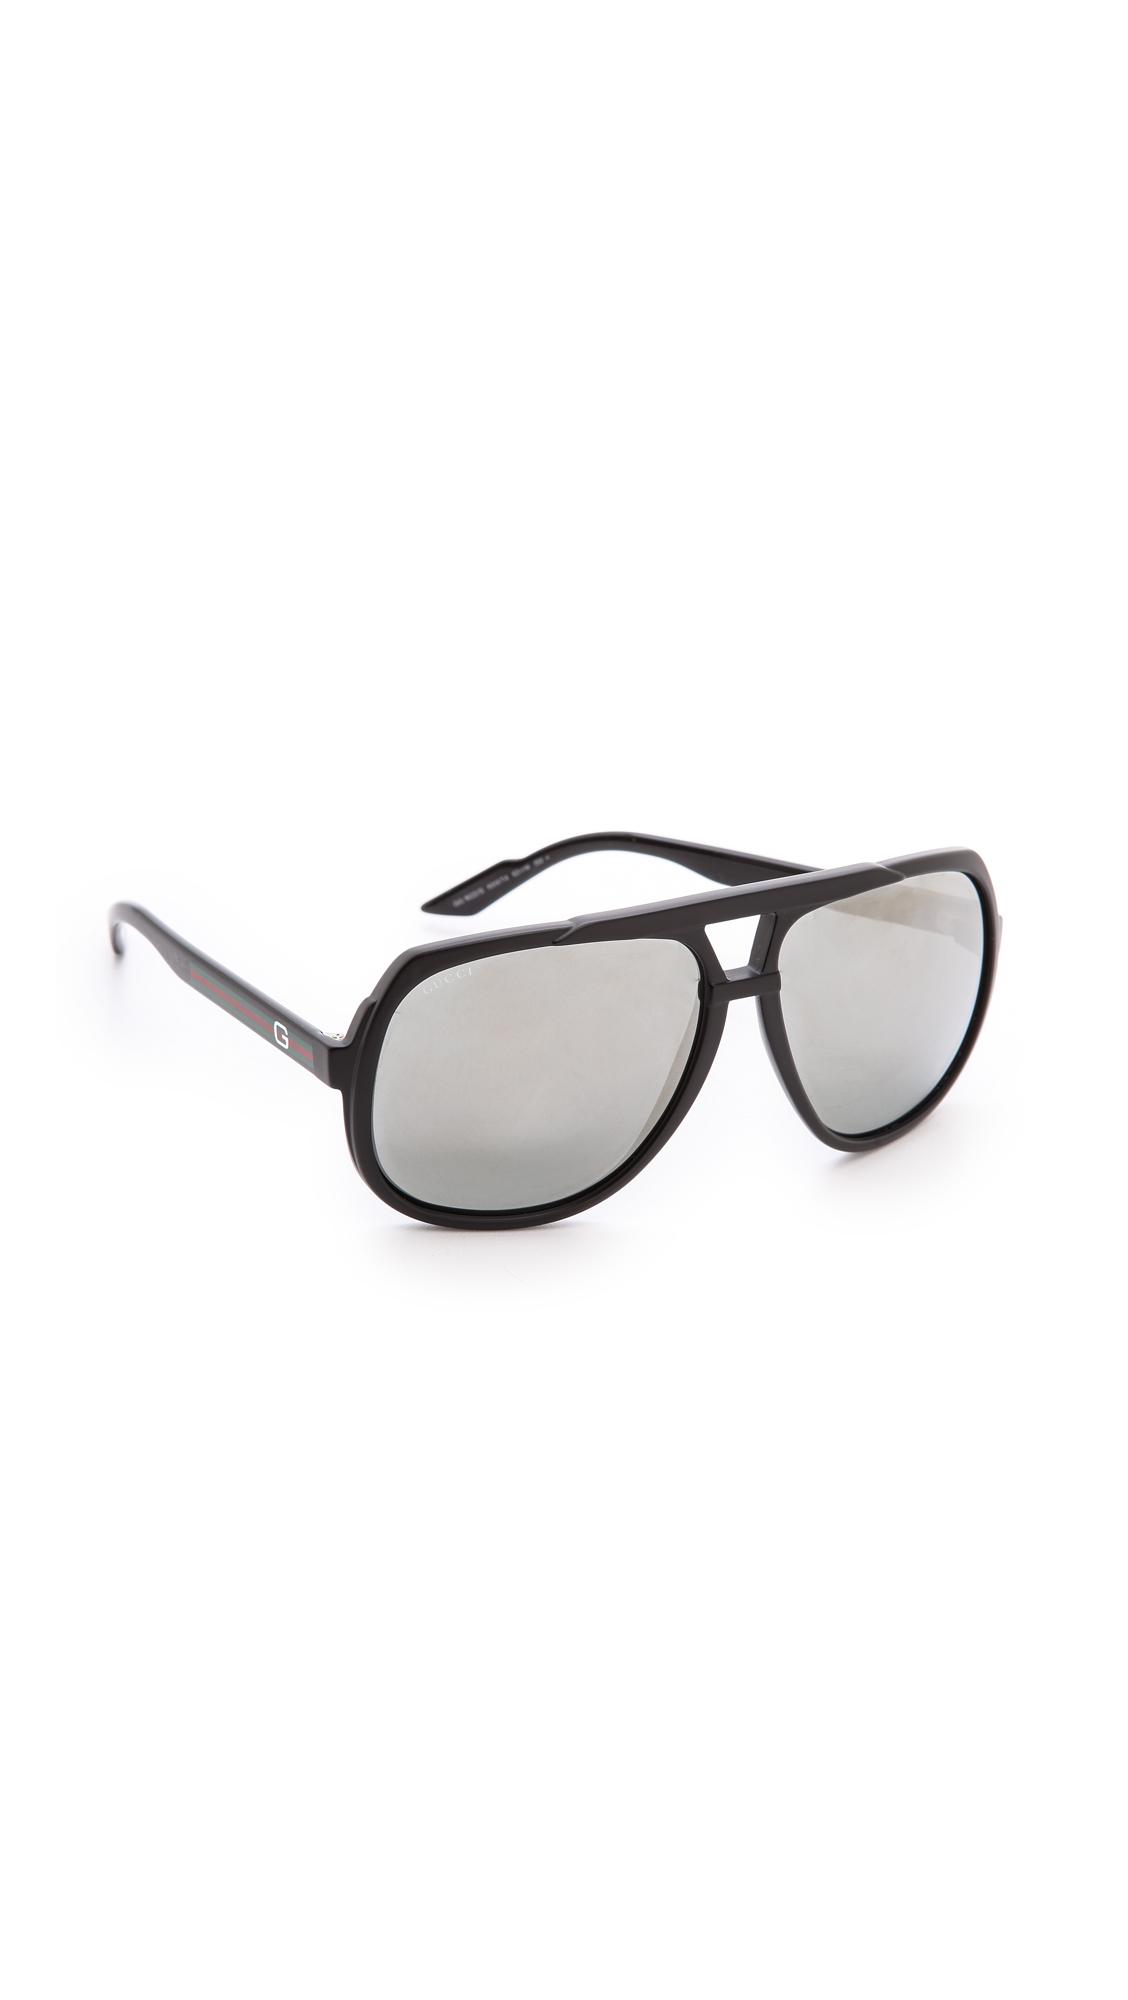 oversized black aviators  Gucci Mirrored Oversized Aviator Sunglasses - Matte Black/Black ...